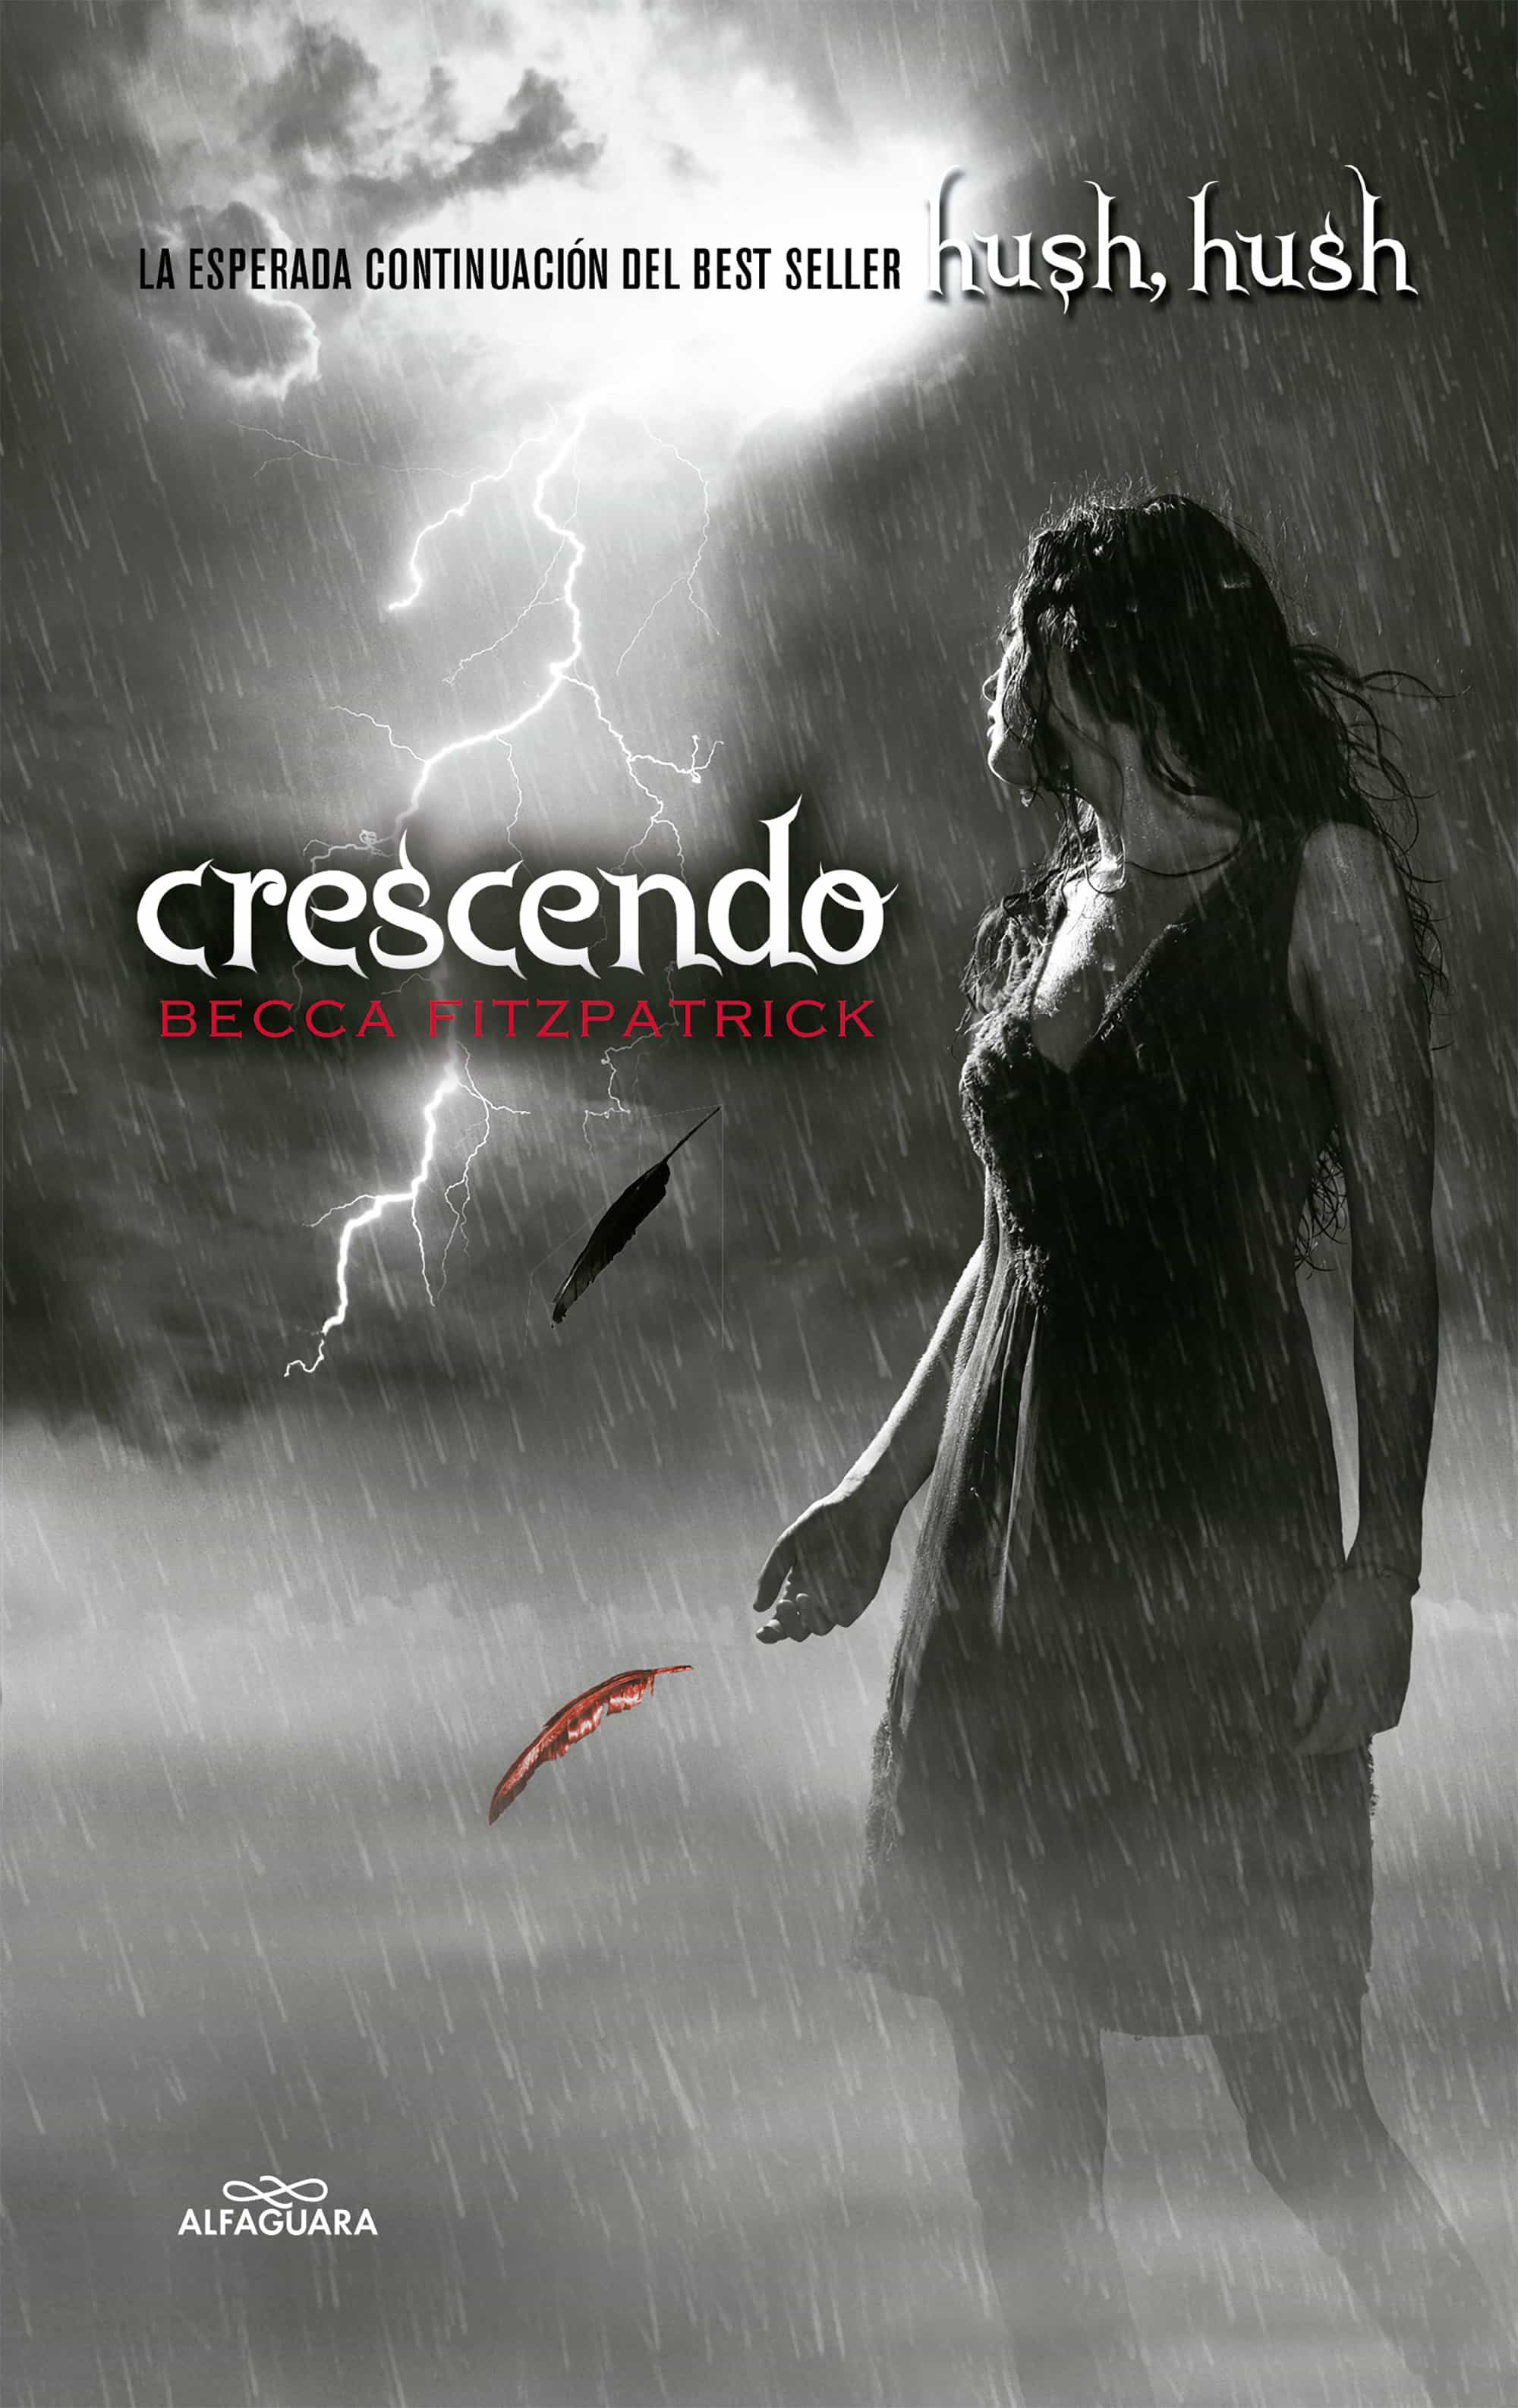 Crescendo (saga Hush, Hush 2) por Becca Fitzpatrick